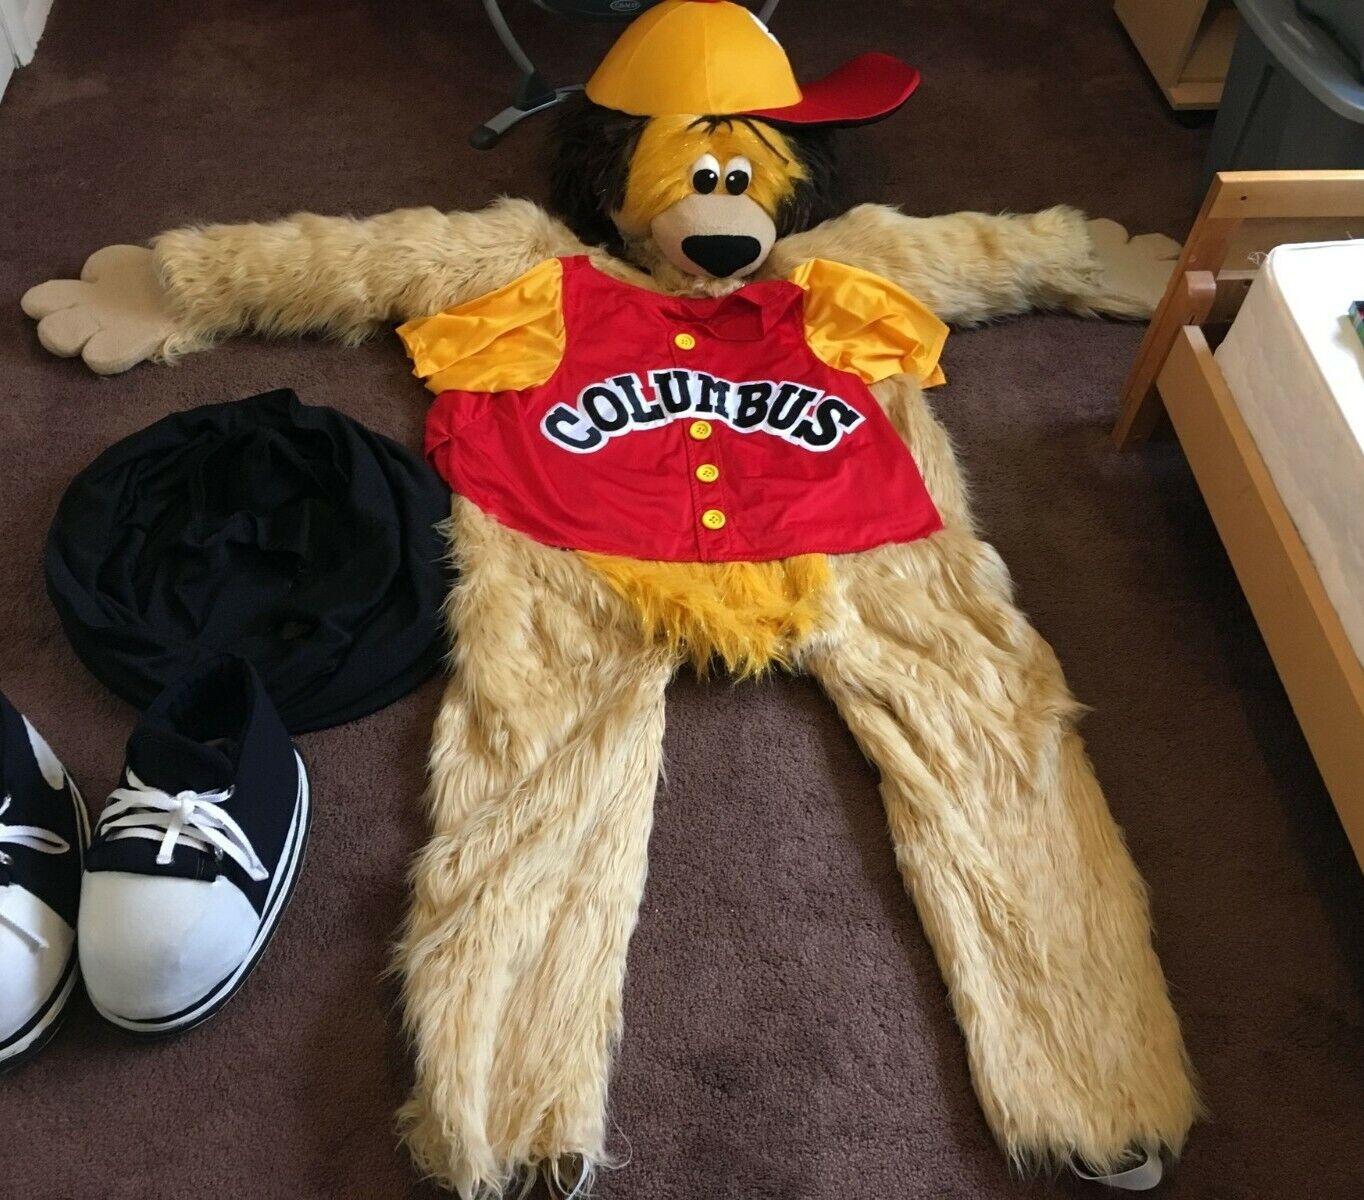 Professional Mascot Costume Suit / Fursuit- Sports Business Prop YouTube TikTok